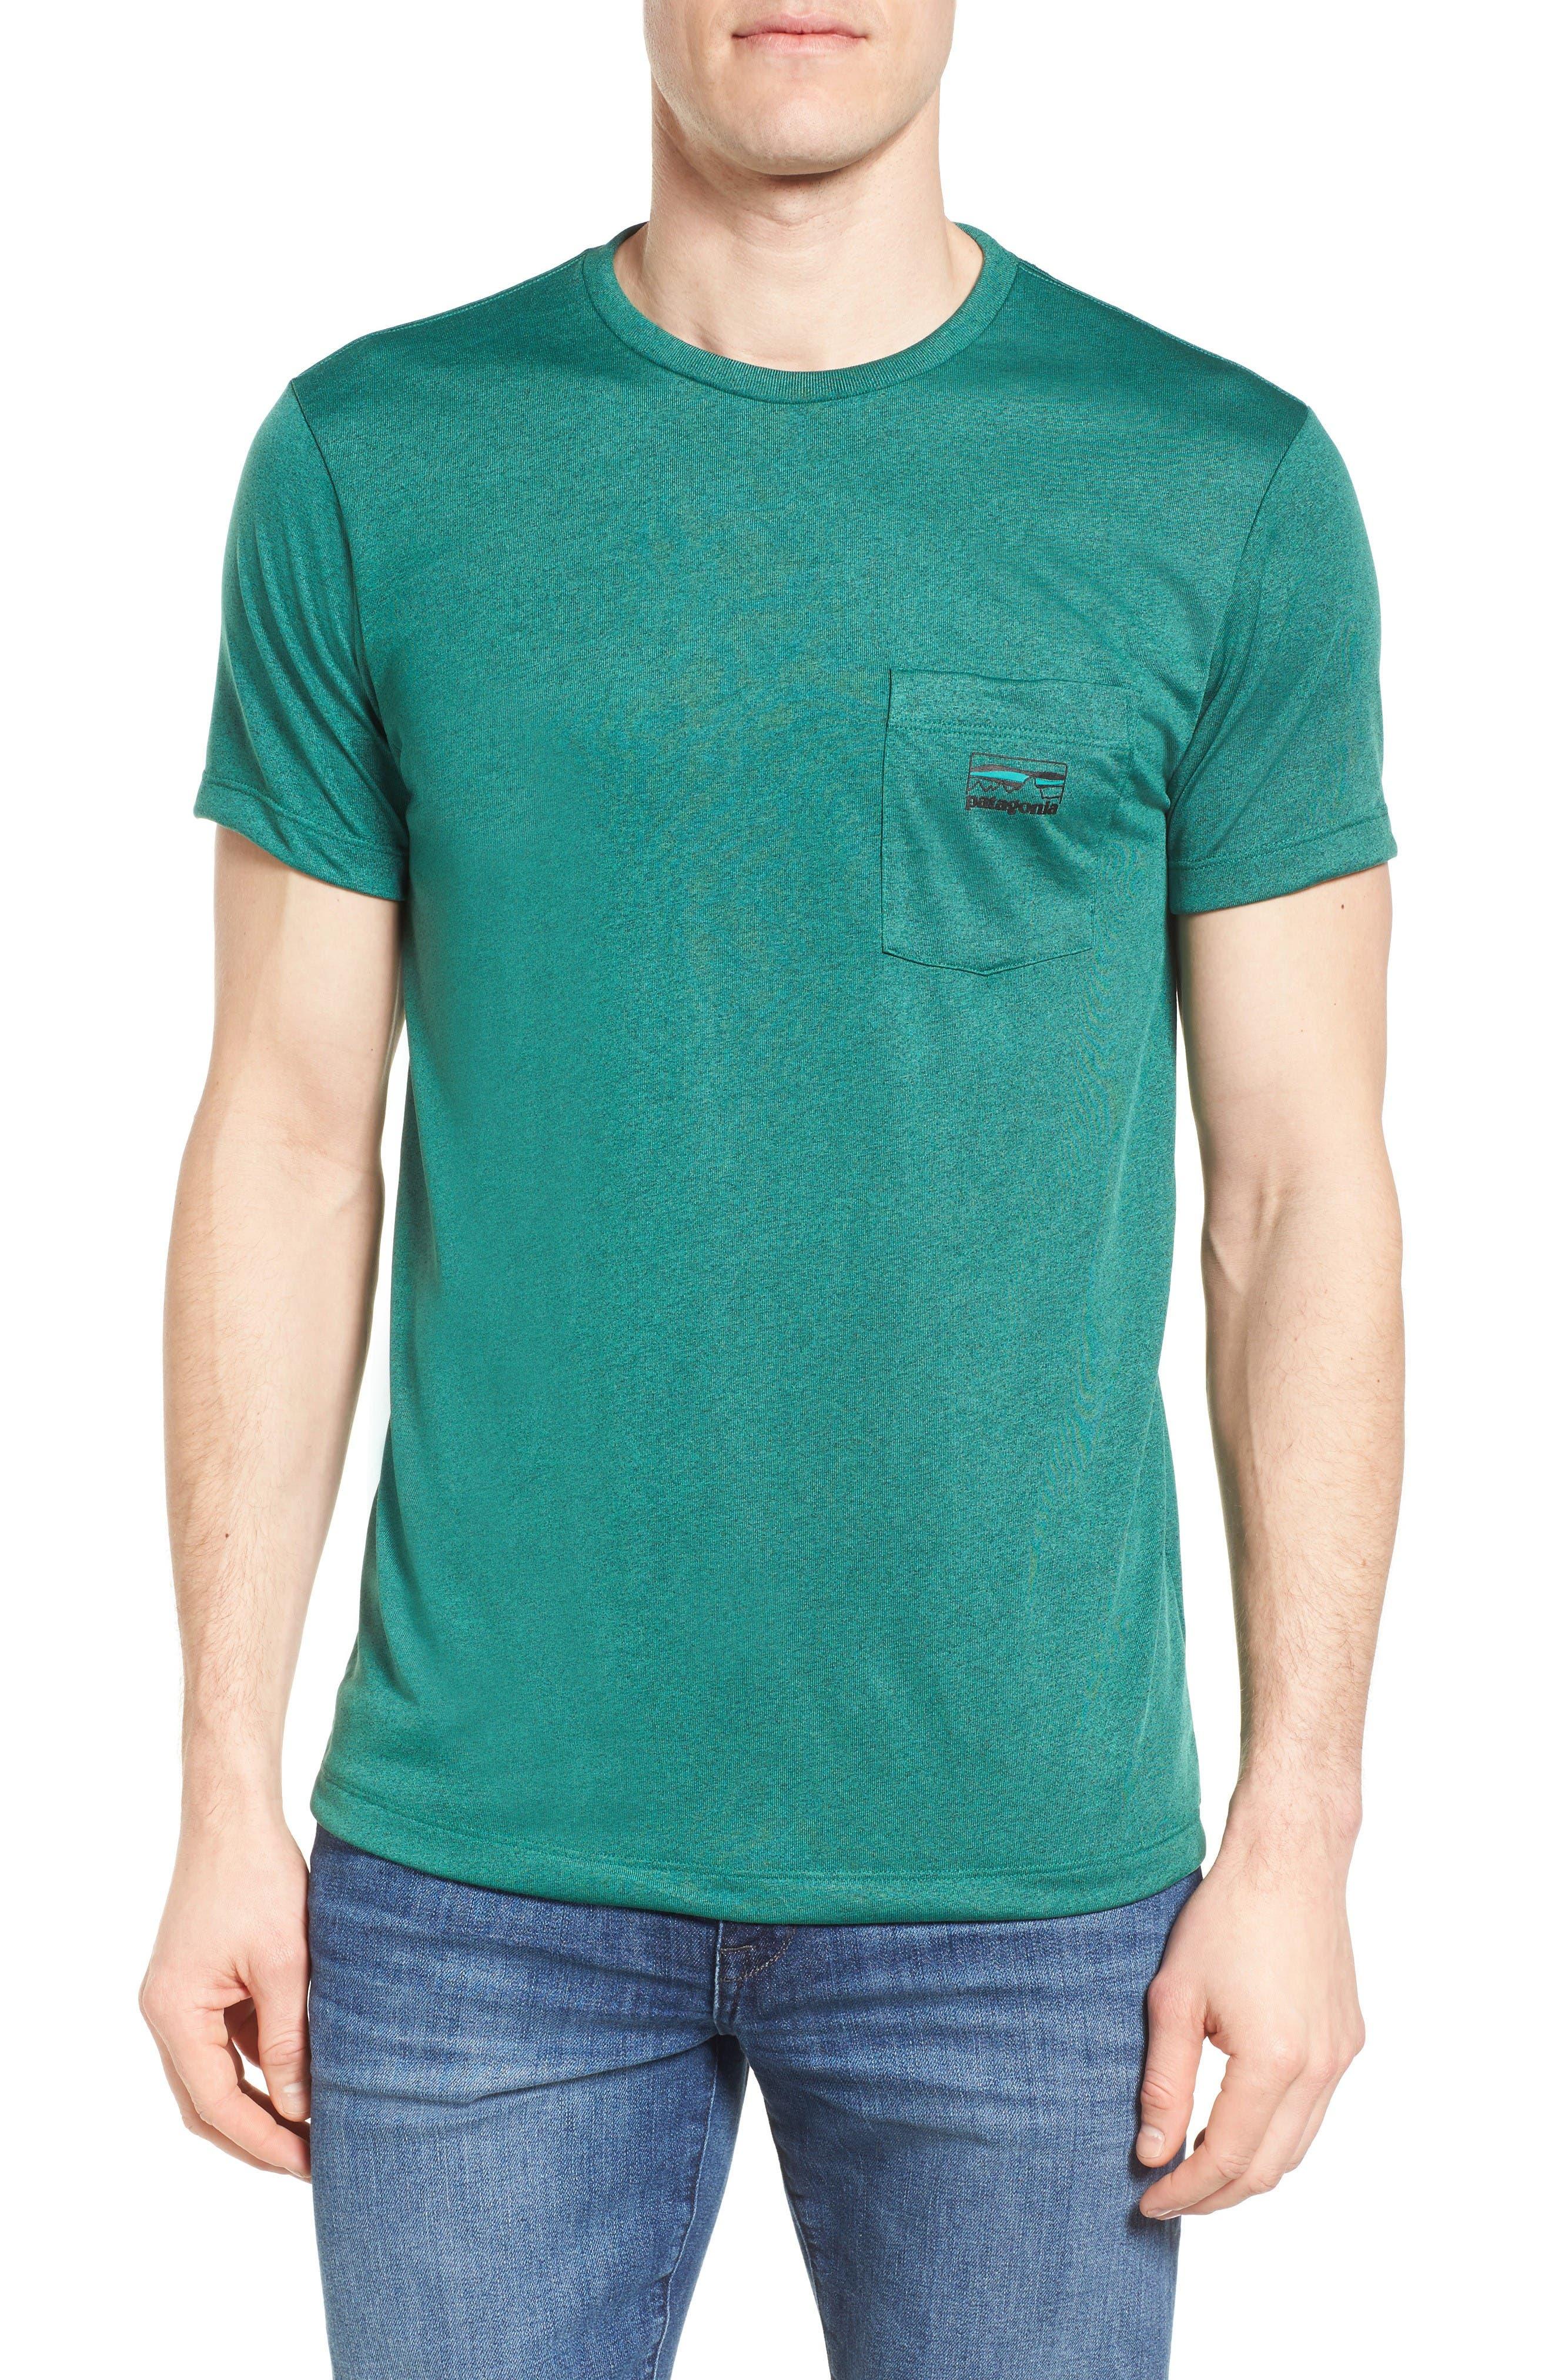 '73 Logo Slim Fit T-Shirt,                             Main thumbnail 1, color,                             Gem Green